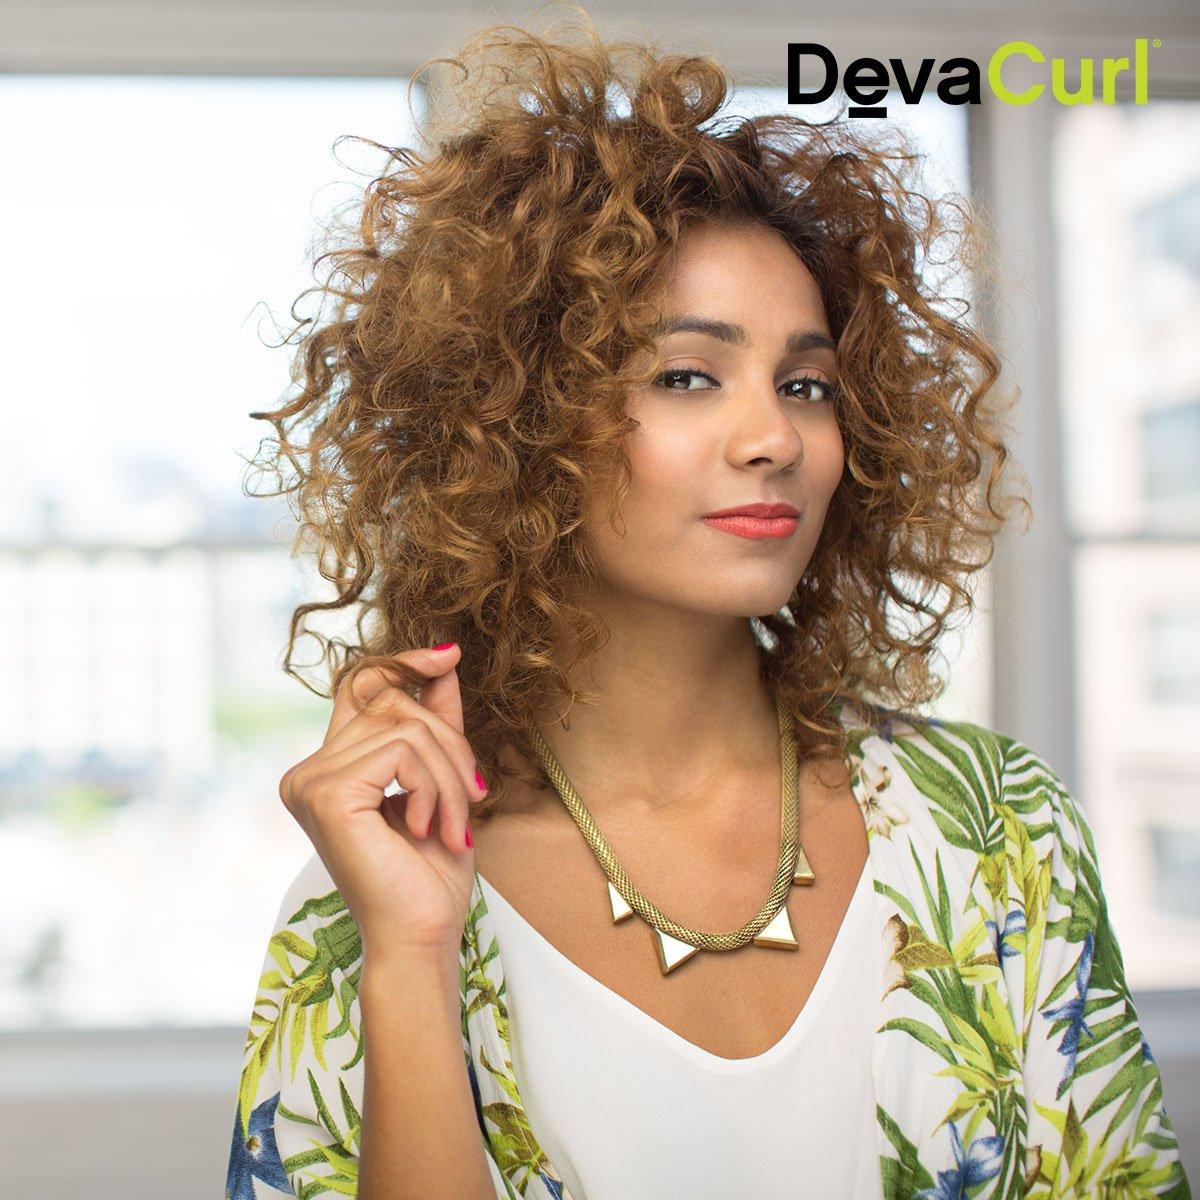 DevaCurl.TheBeautifulMess